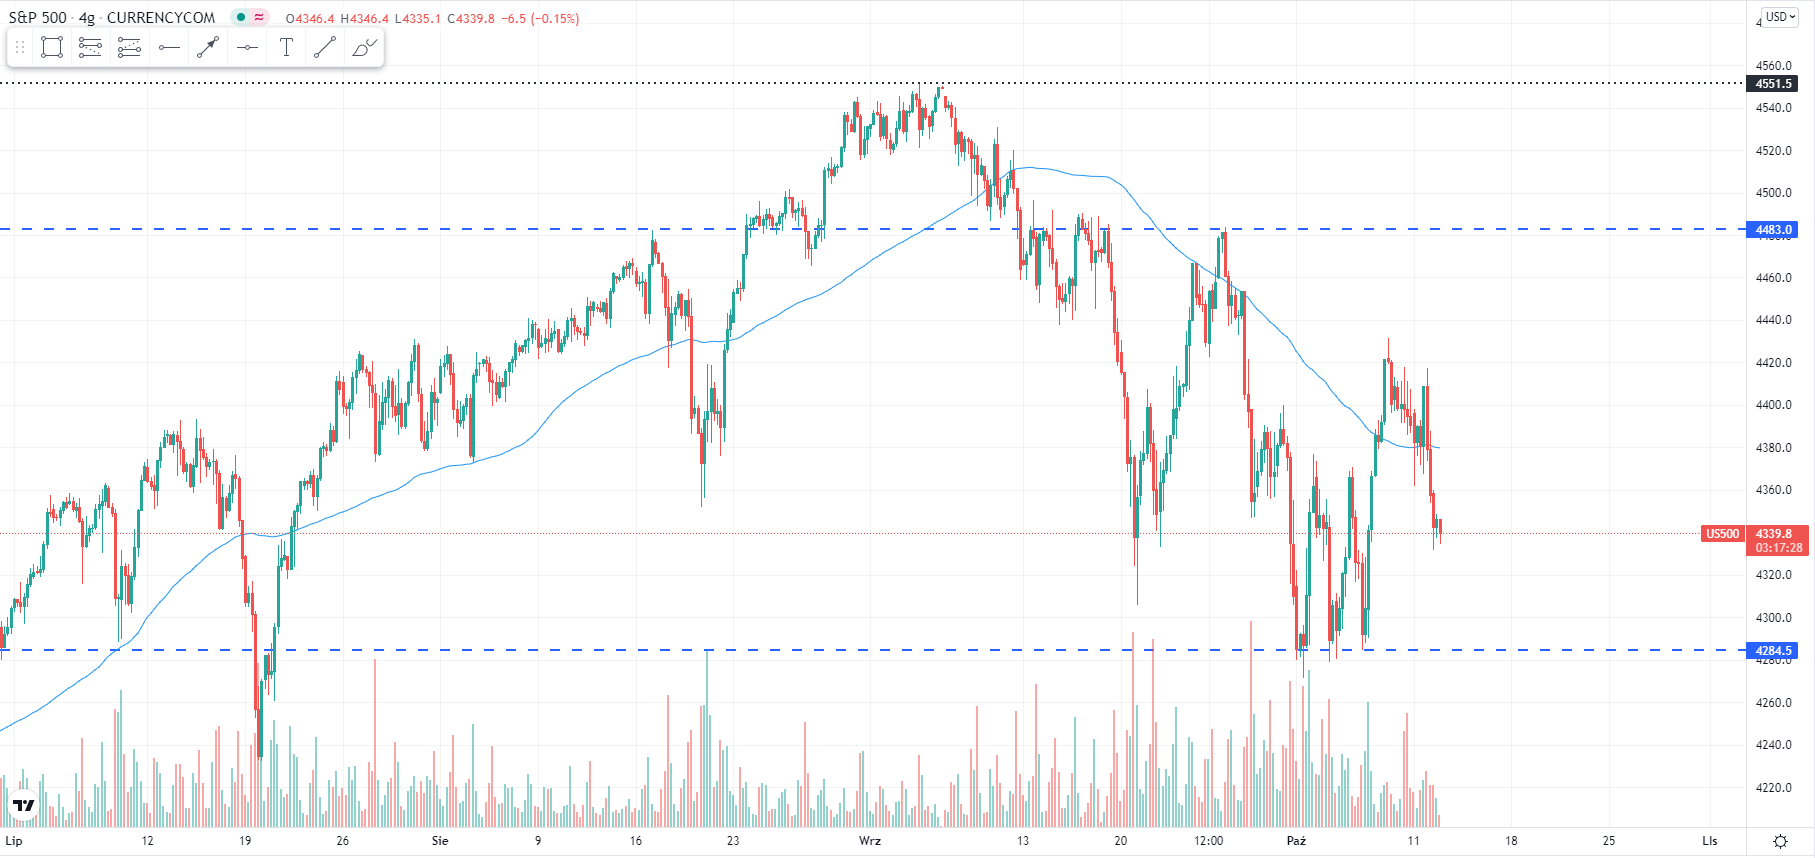 wykres Kurs S&P 500 H4 12.10.2021